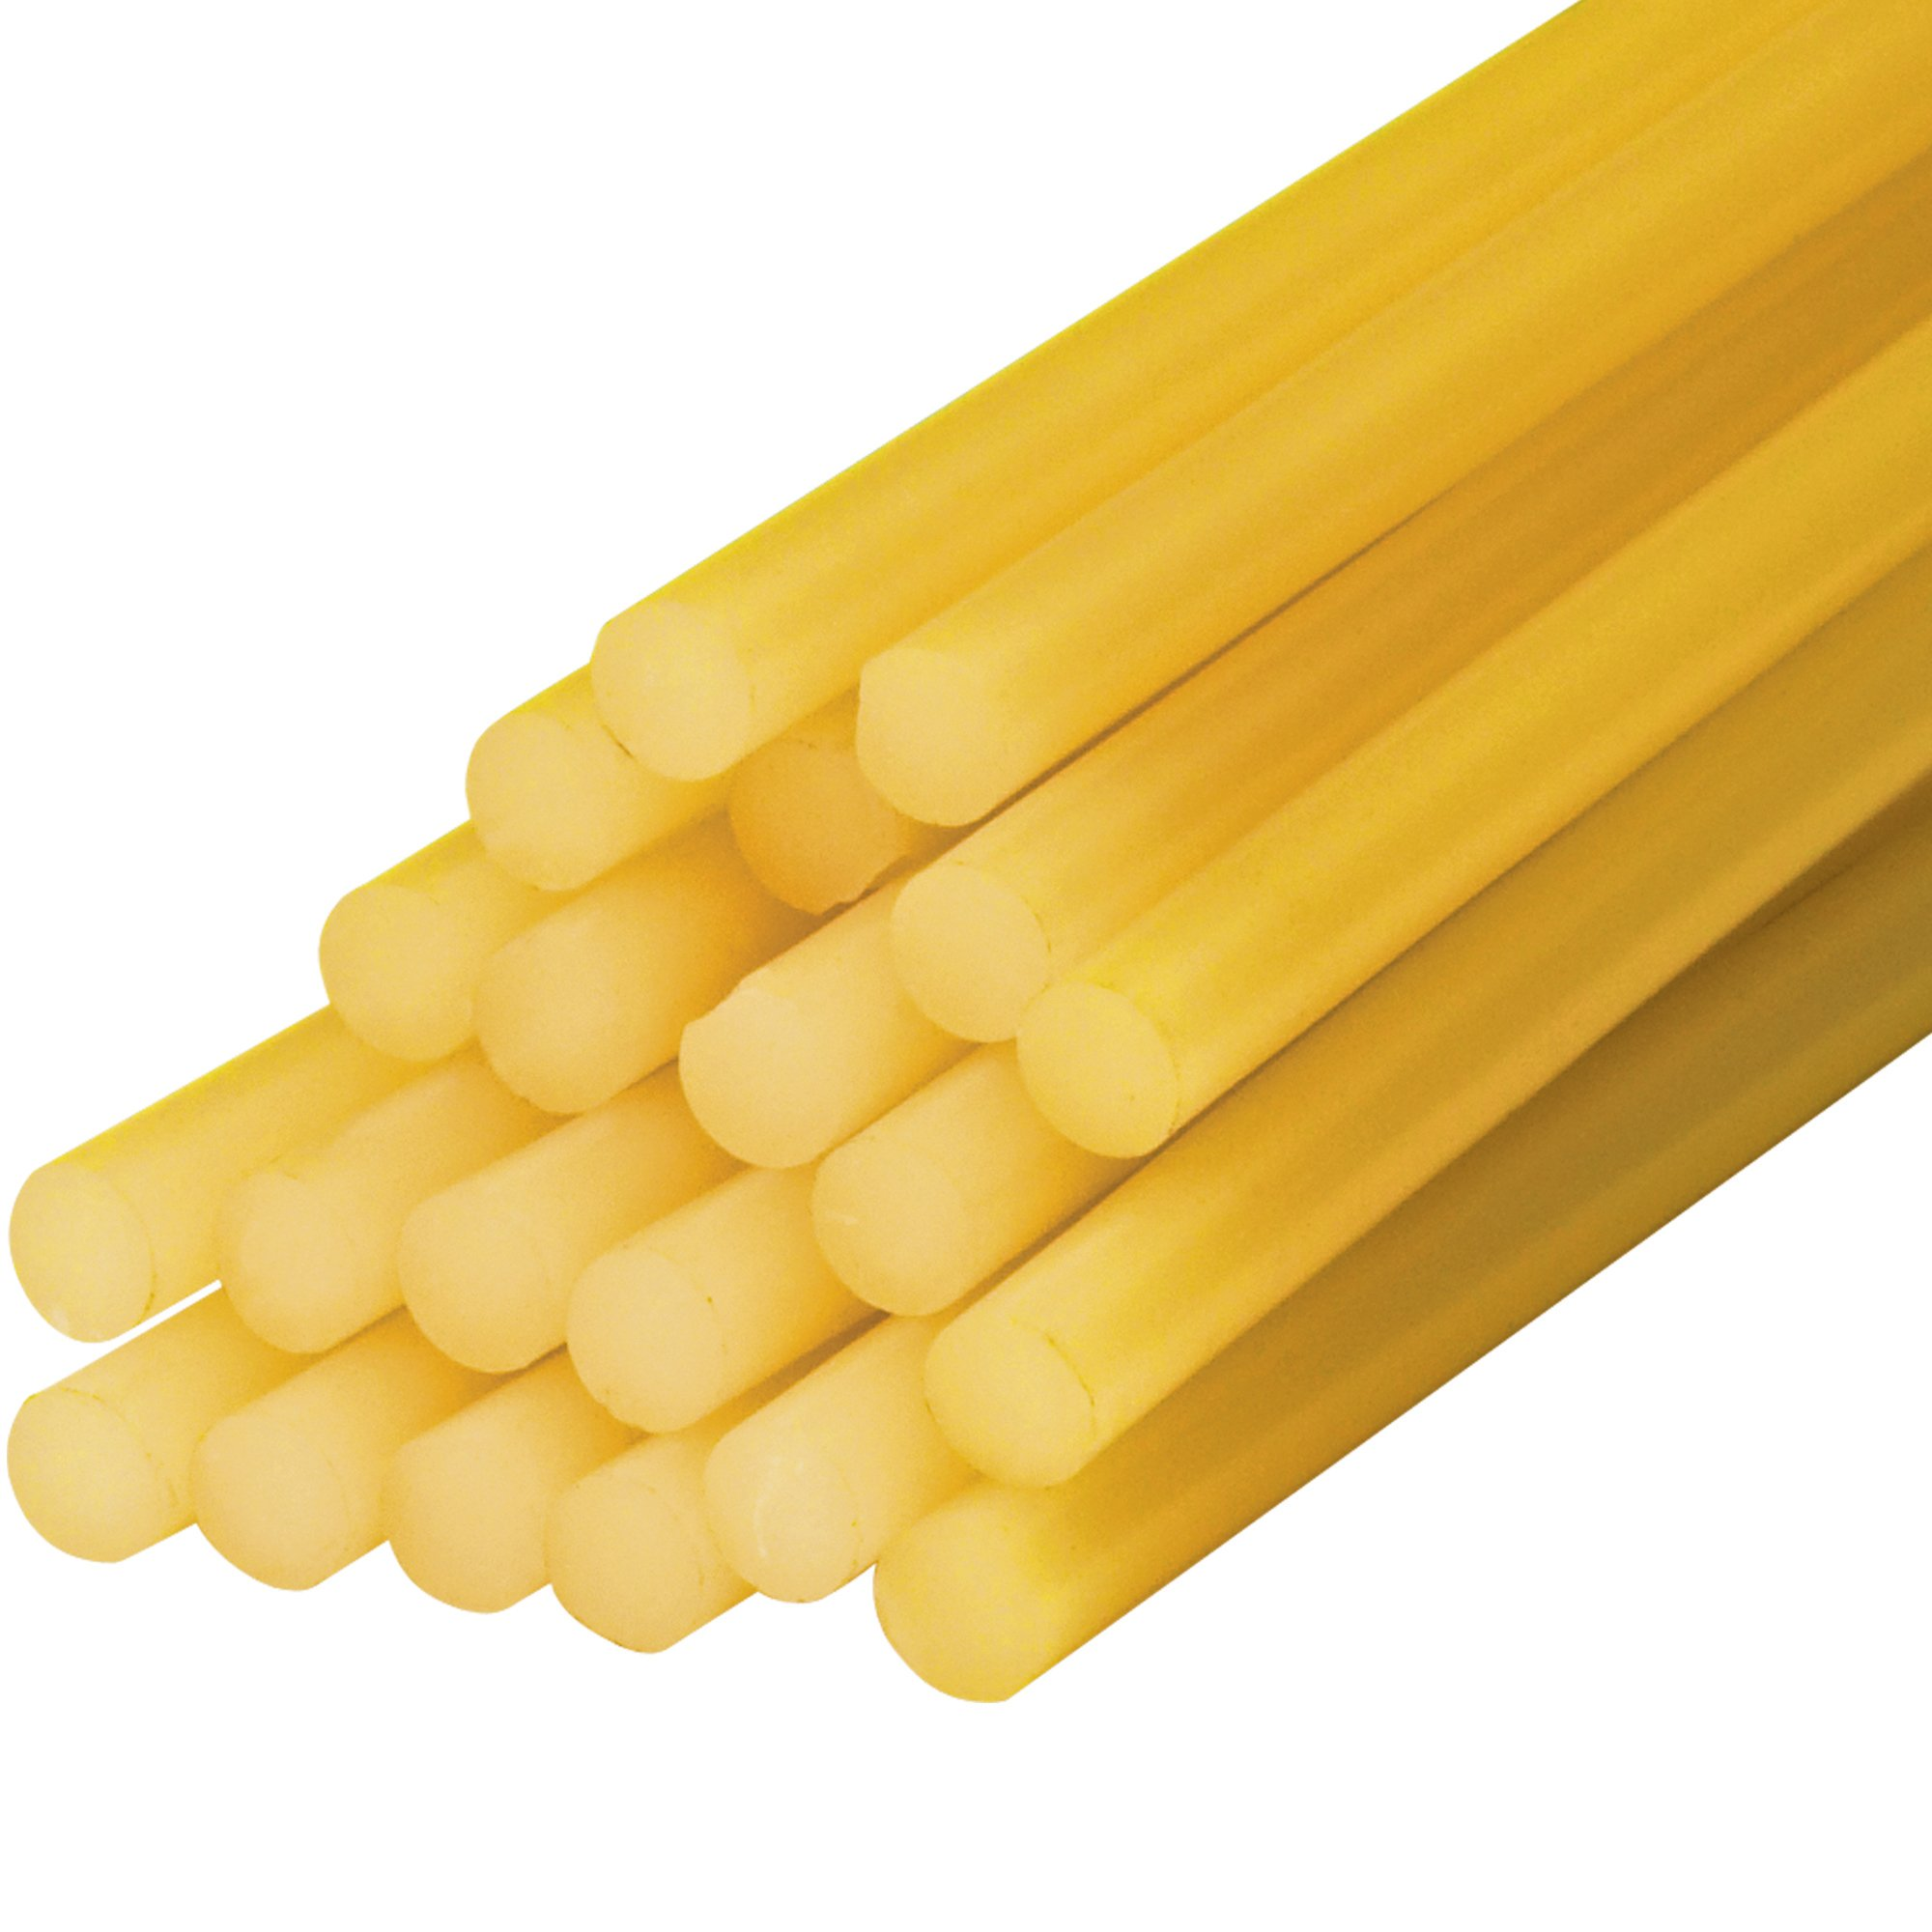 BOX BGL4007 Amber Glue Sticks,15'' Length, 0.5'' Width (Pack of 60)